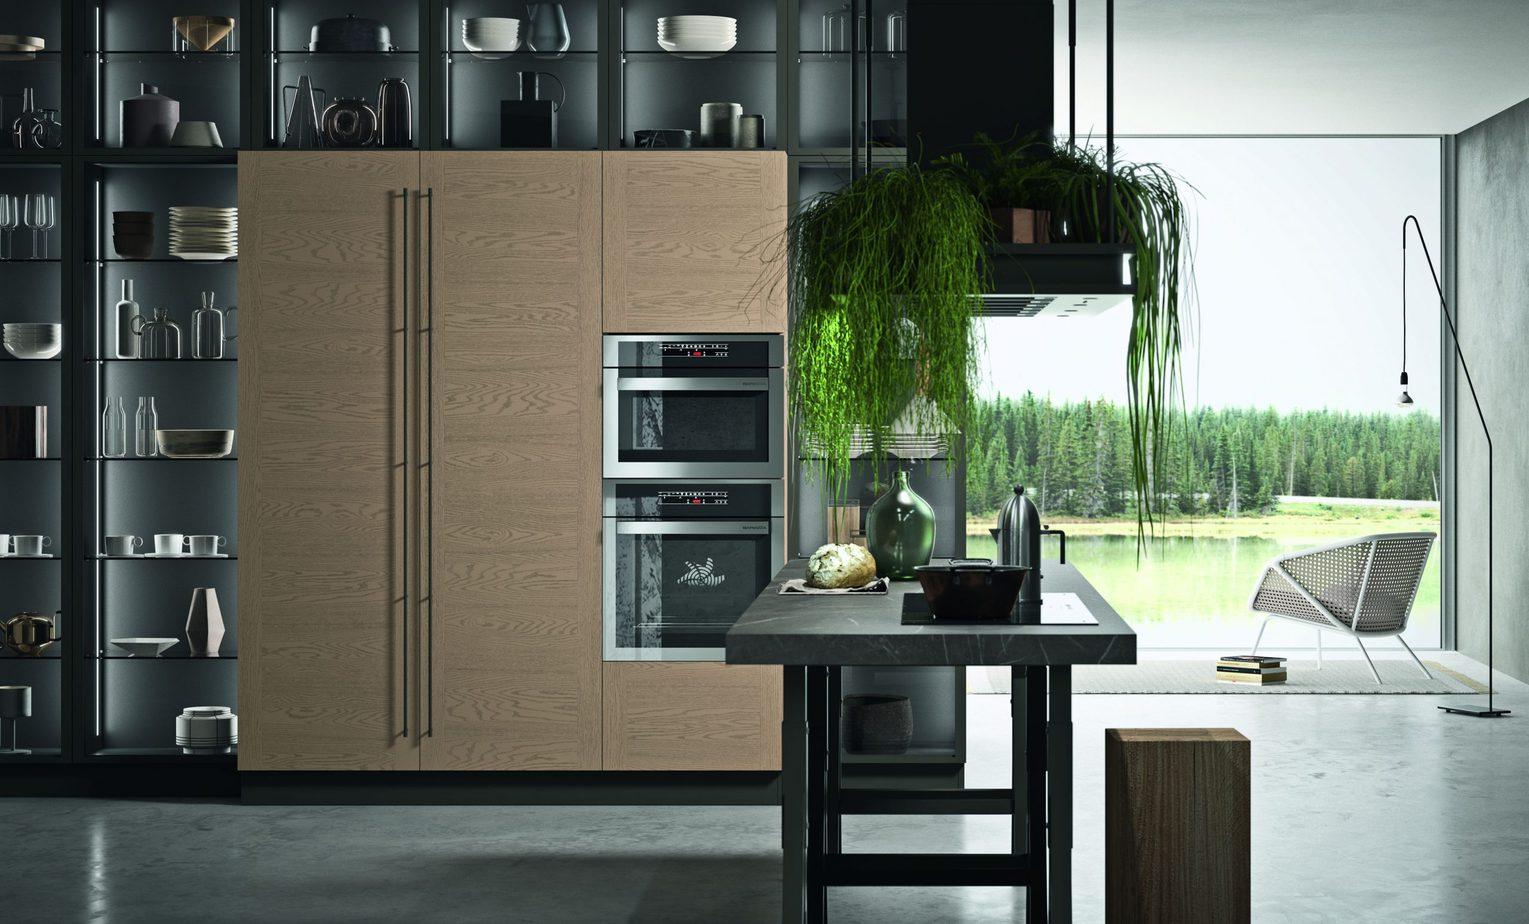 Isola con cottura in una cucina design in HPL